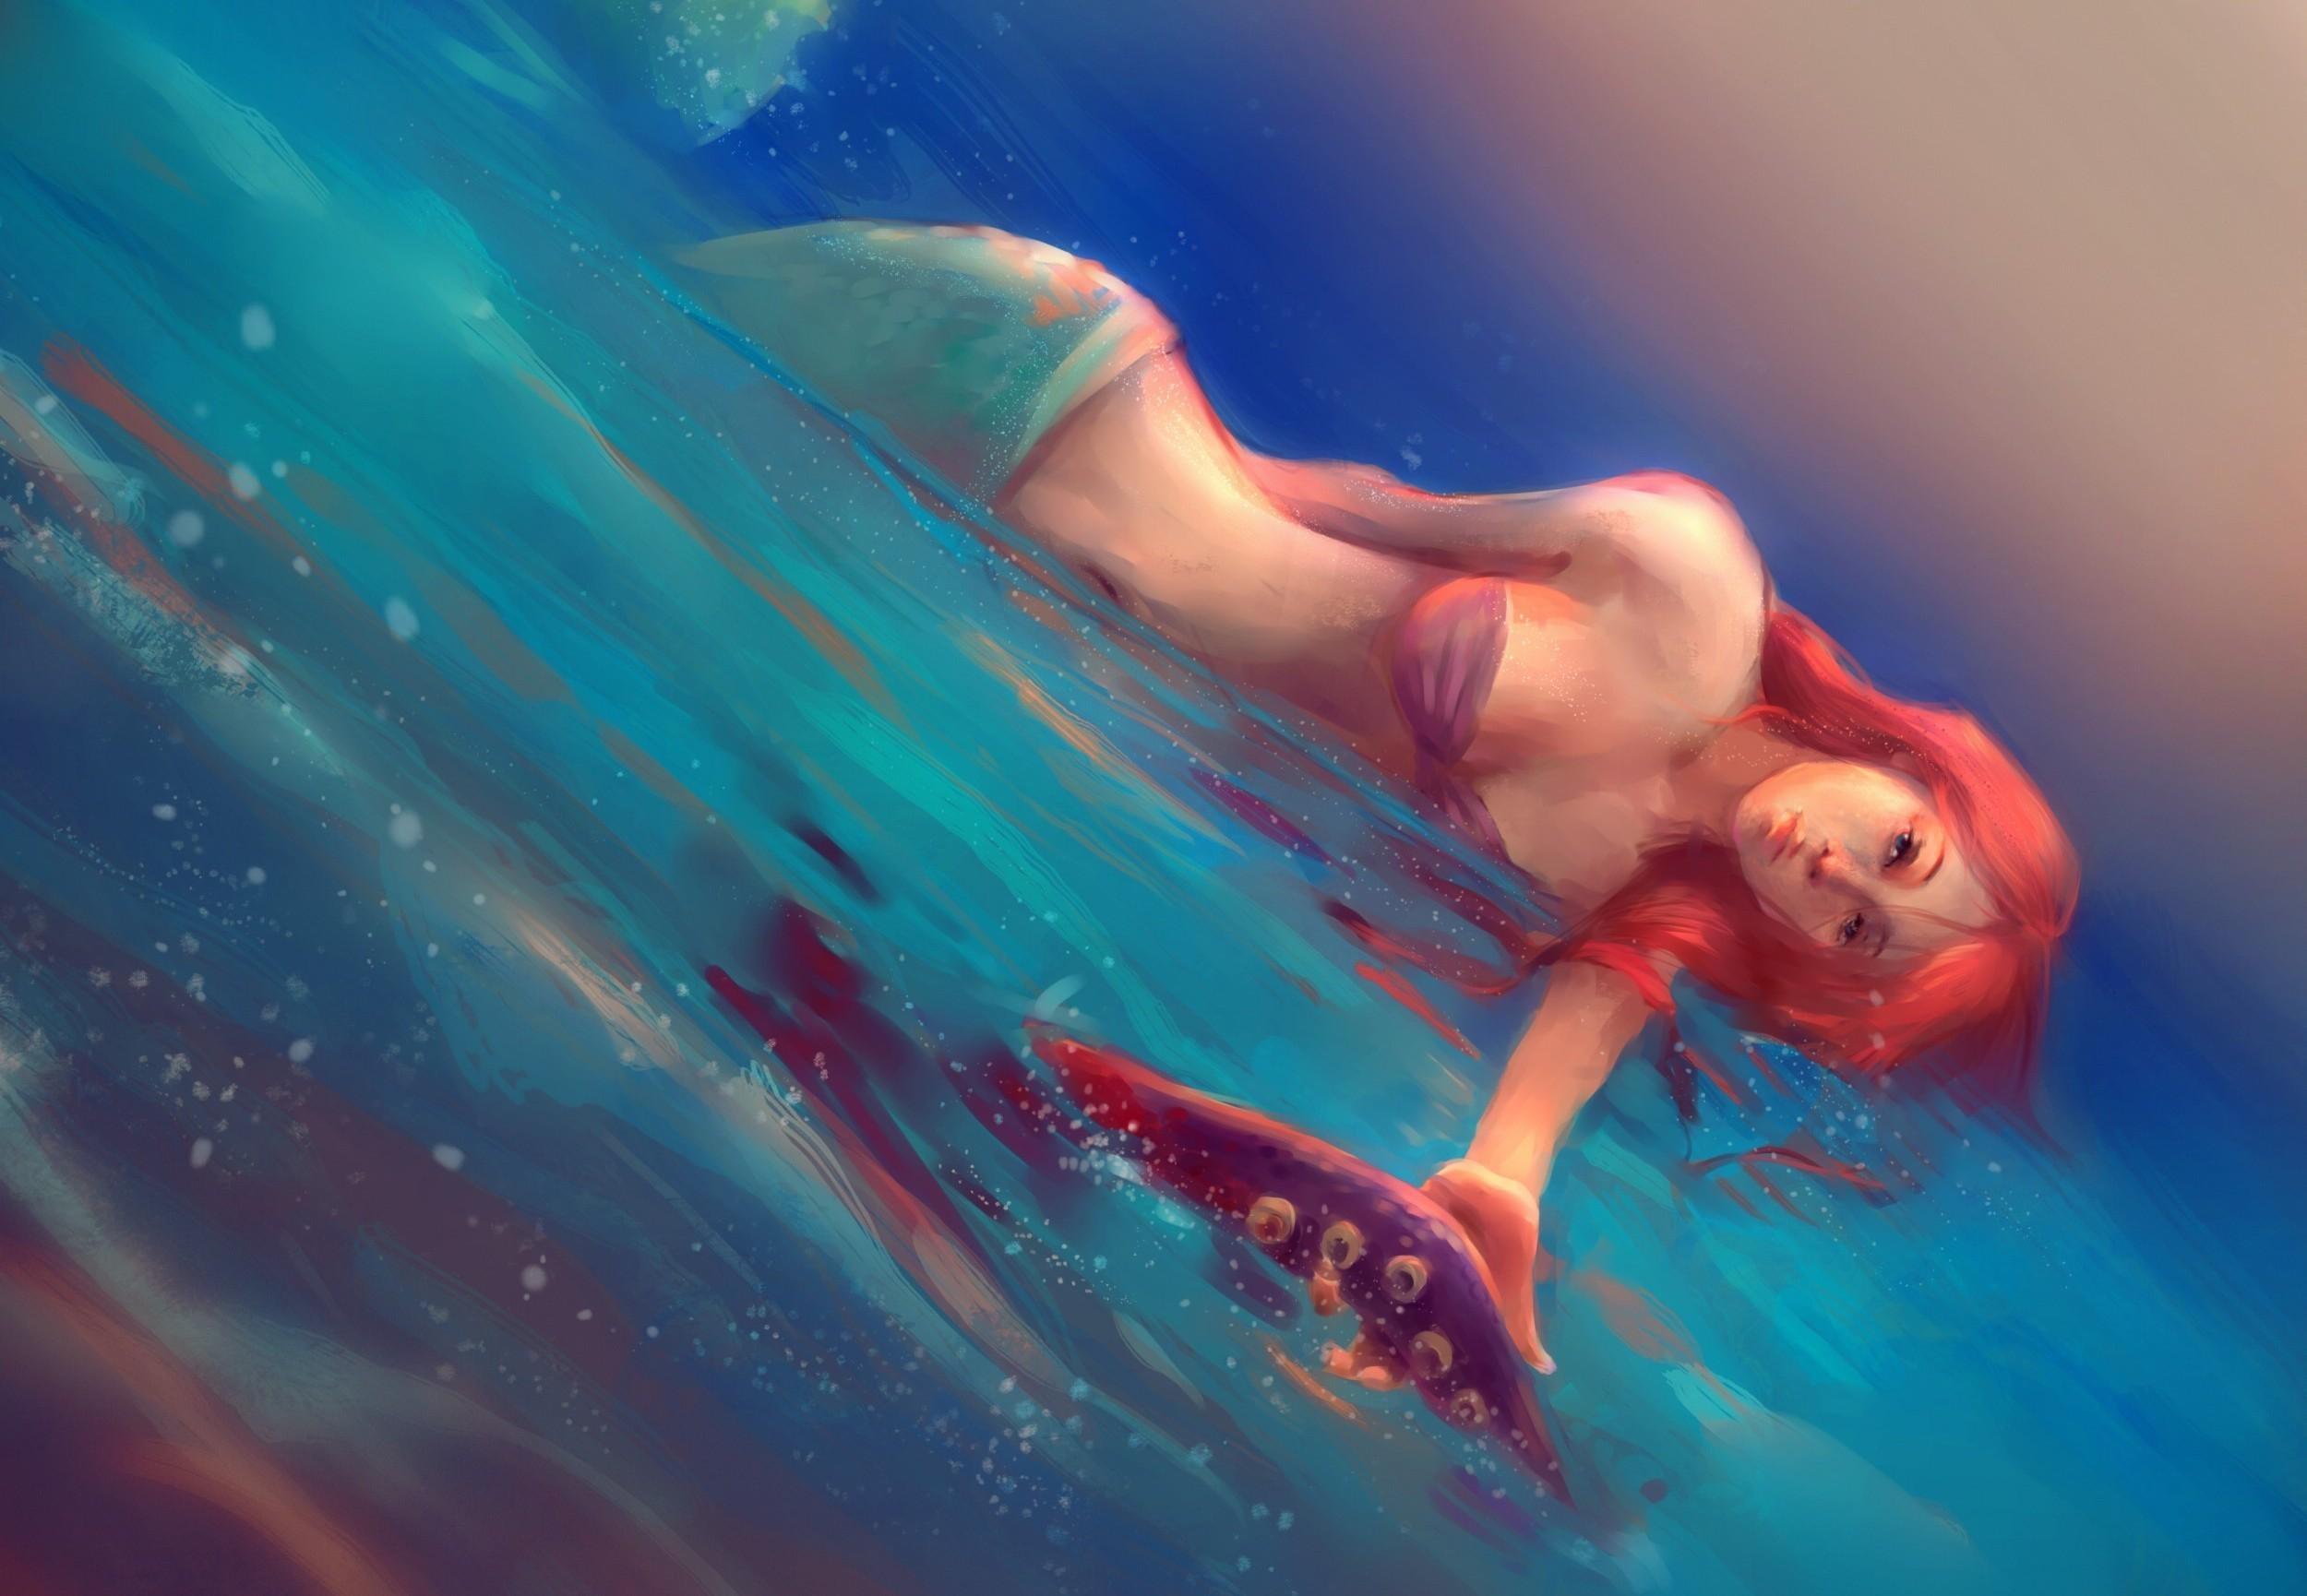 Anime Mermaid Wallpaper